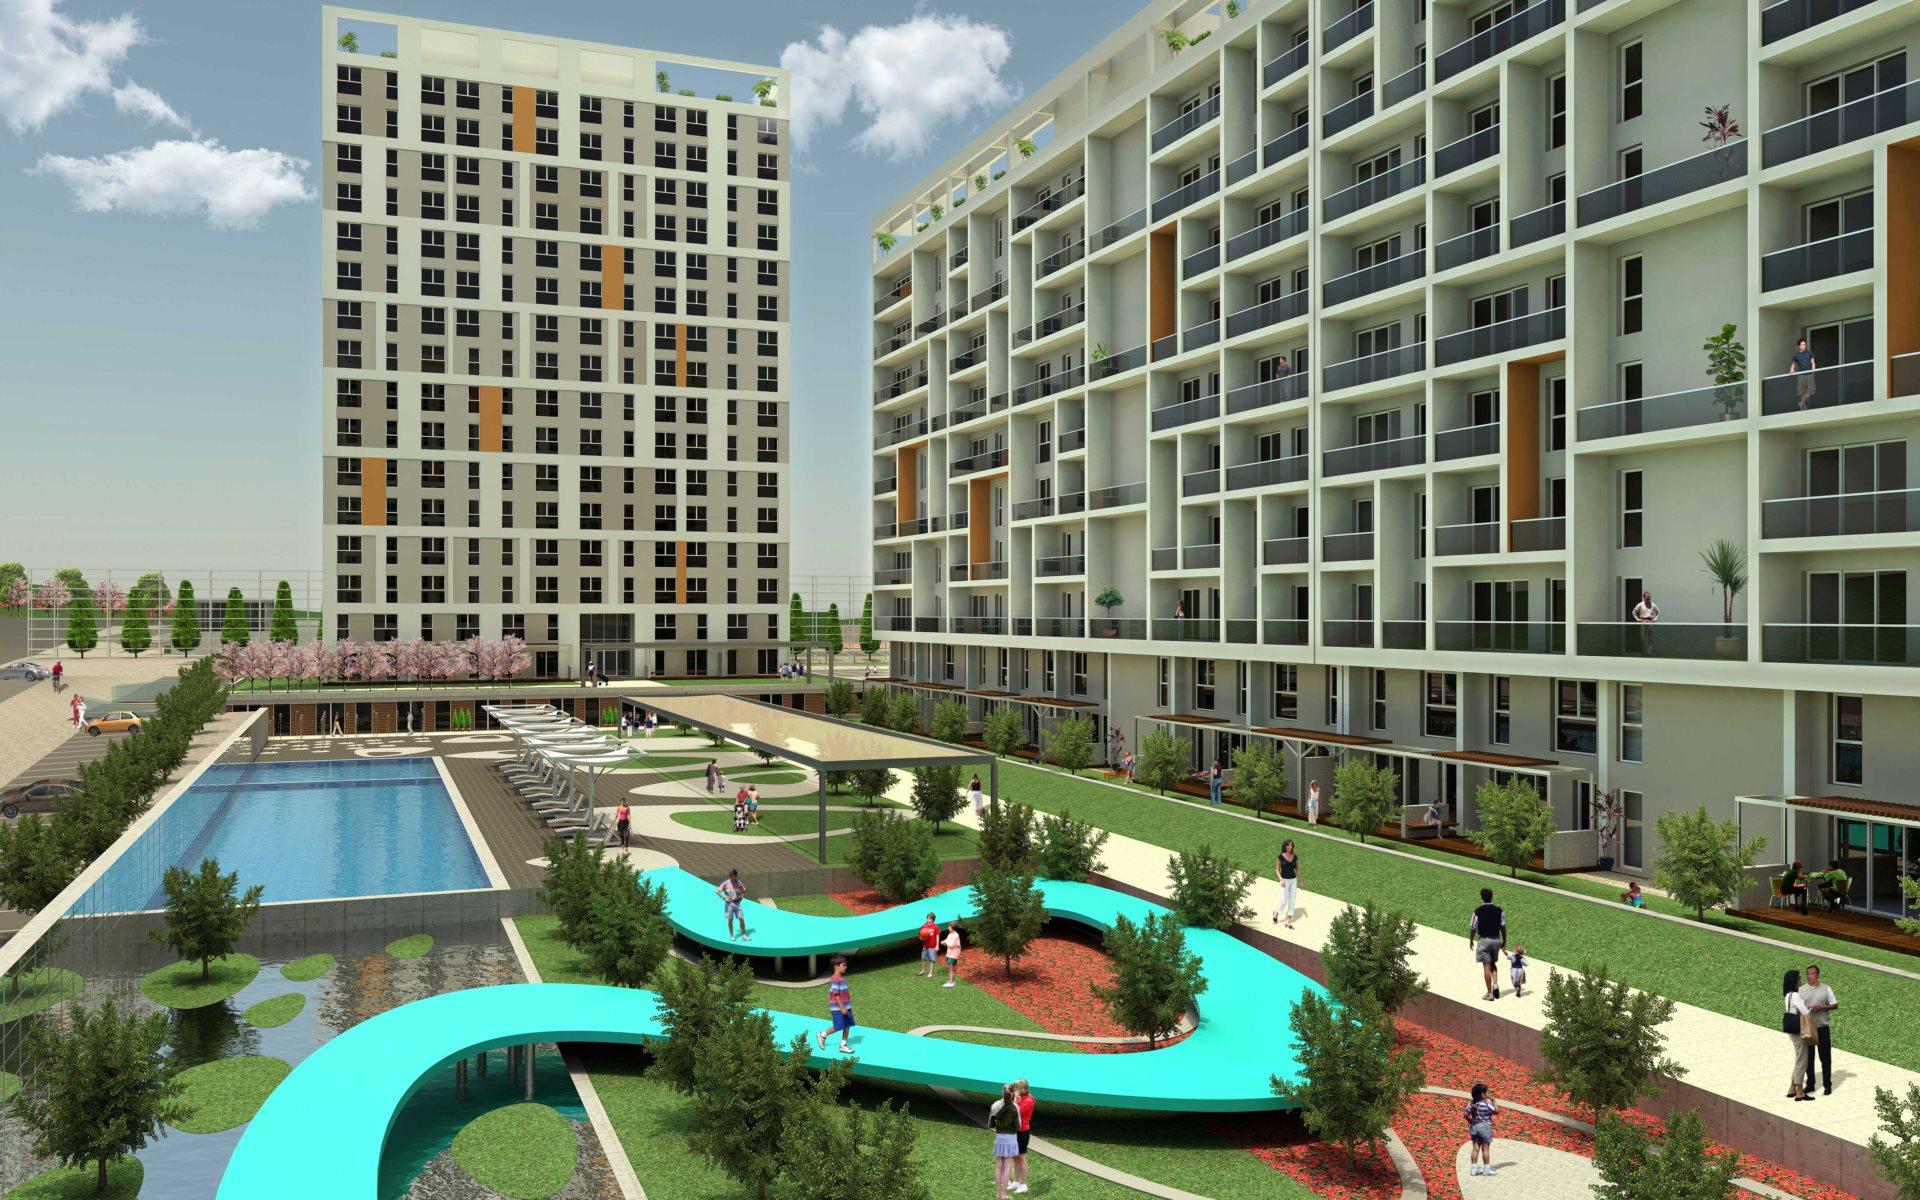 Soyak Park Aparts'da Yönetim Platformu Apsiyon